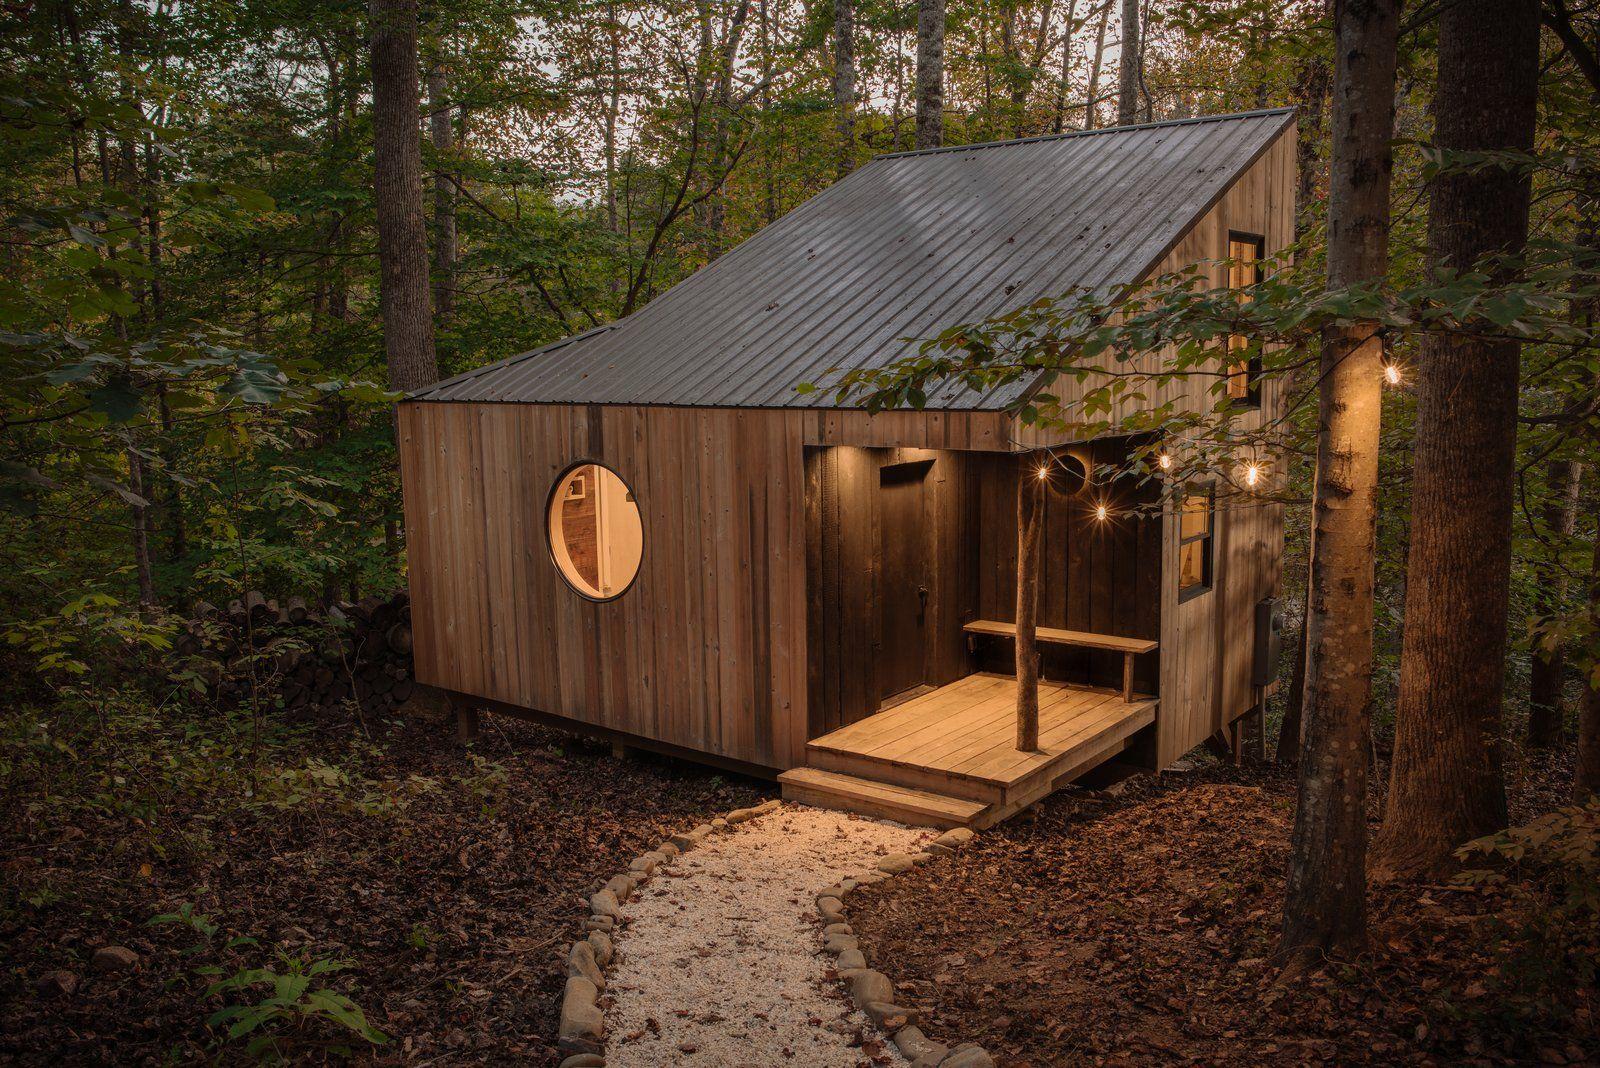 The Nook By Shelter Design Studio In 2020 North Carolina